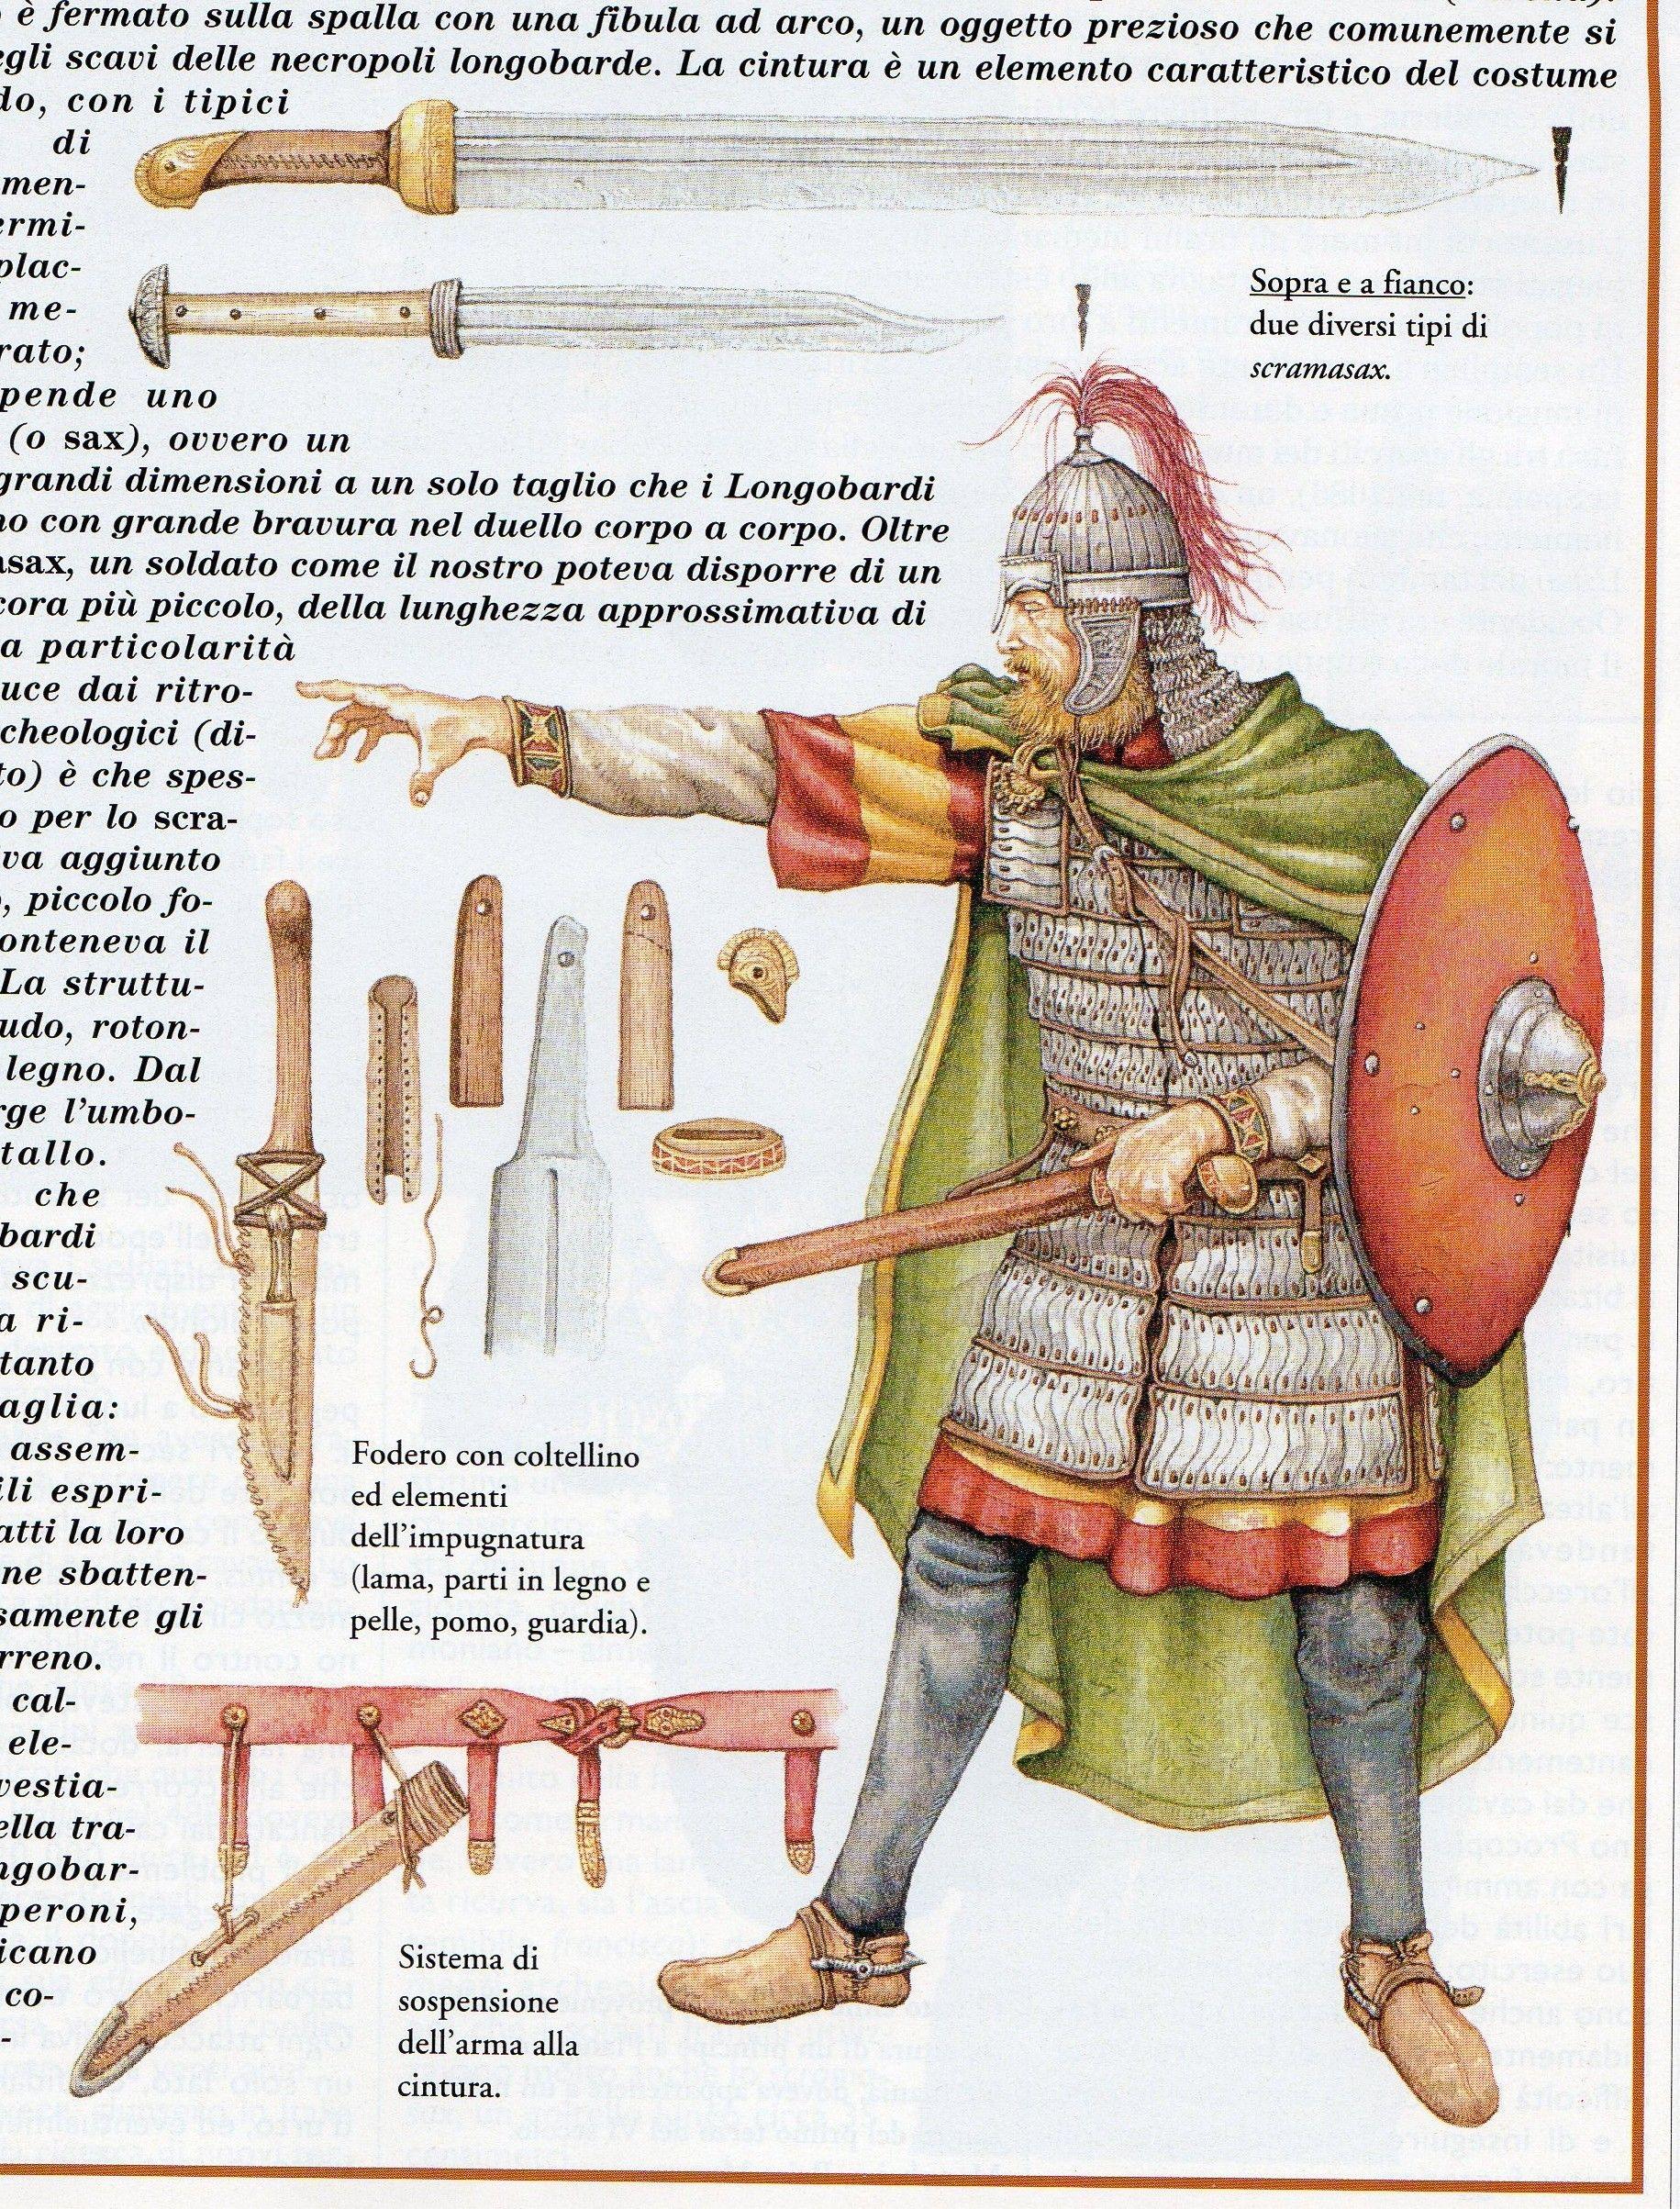 Guerriero Longobardo, VII secolo d.C.